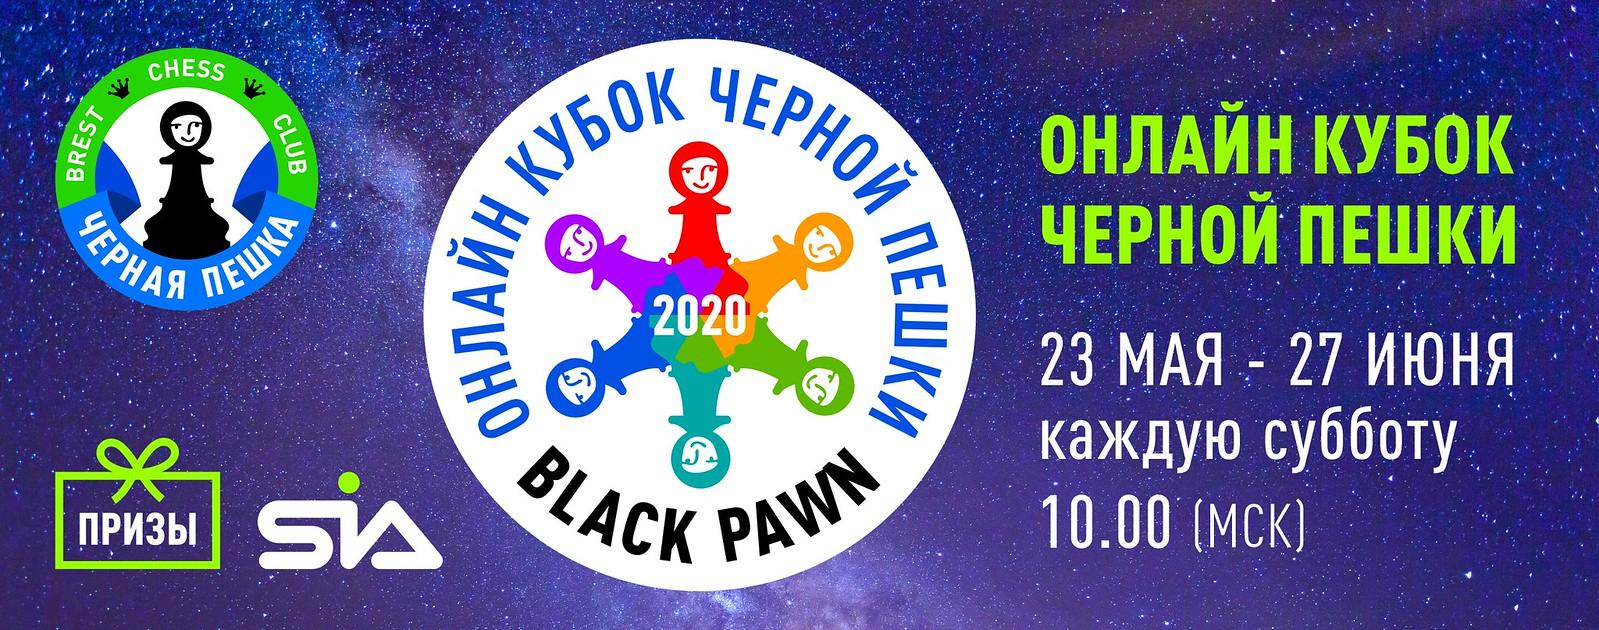 Онлайн Кубок Черной Пешки 2020 2